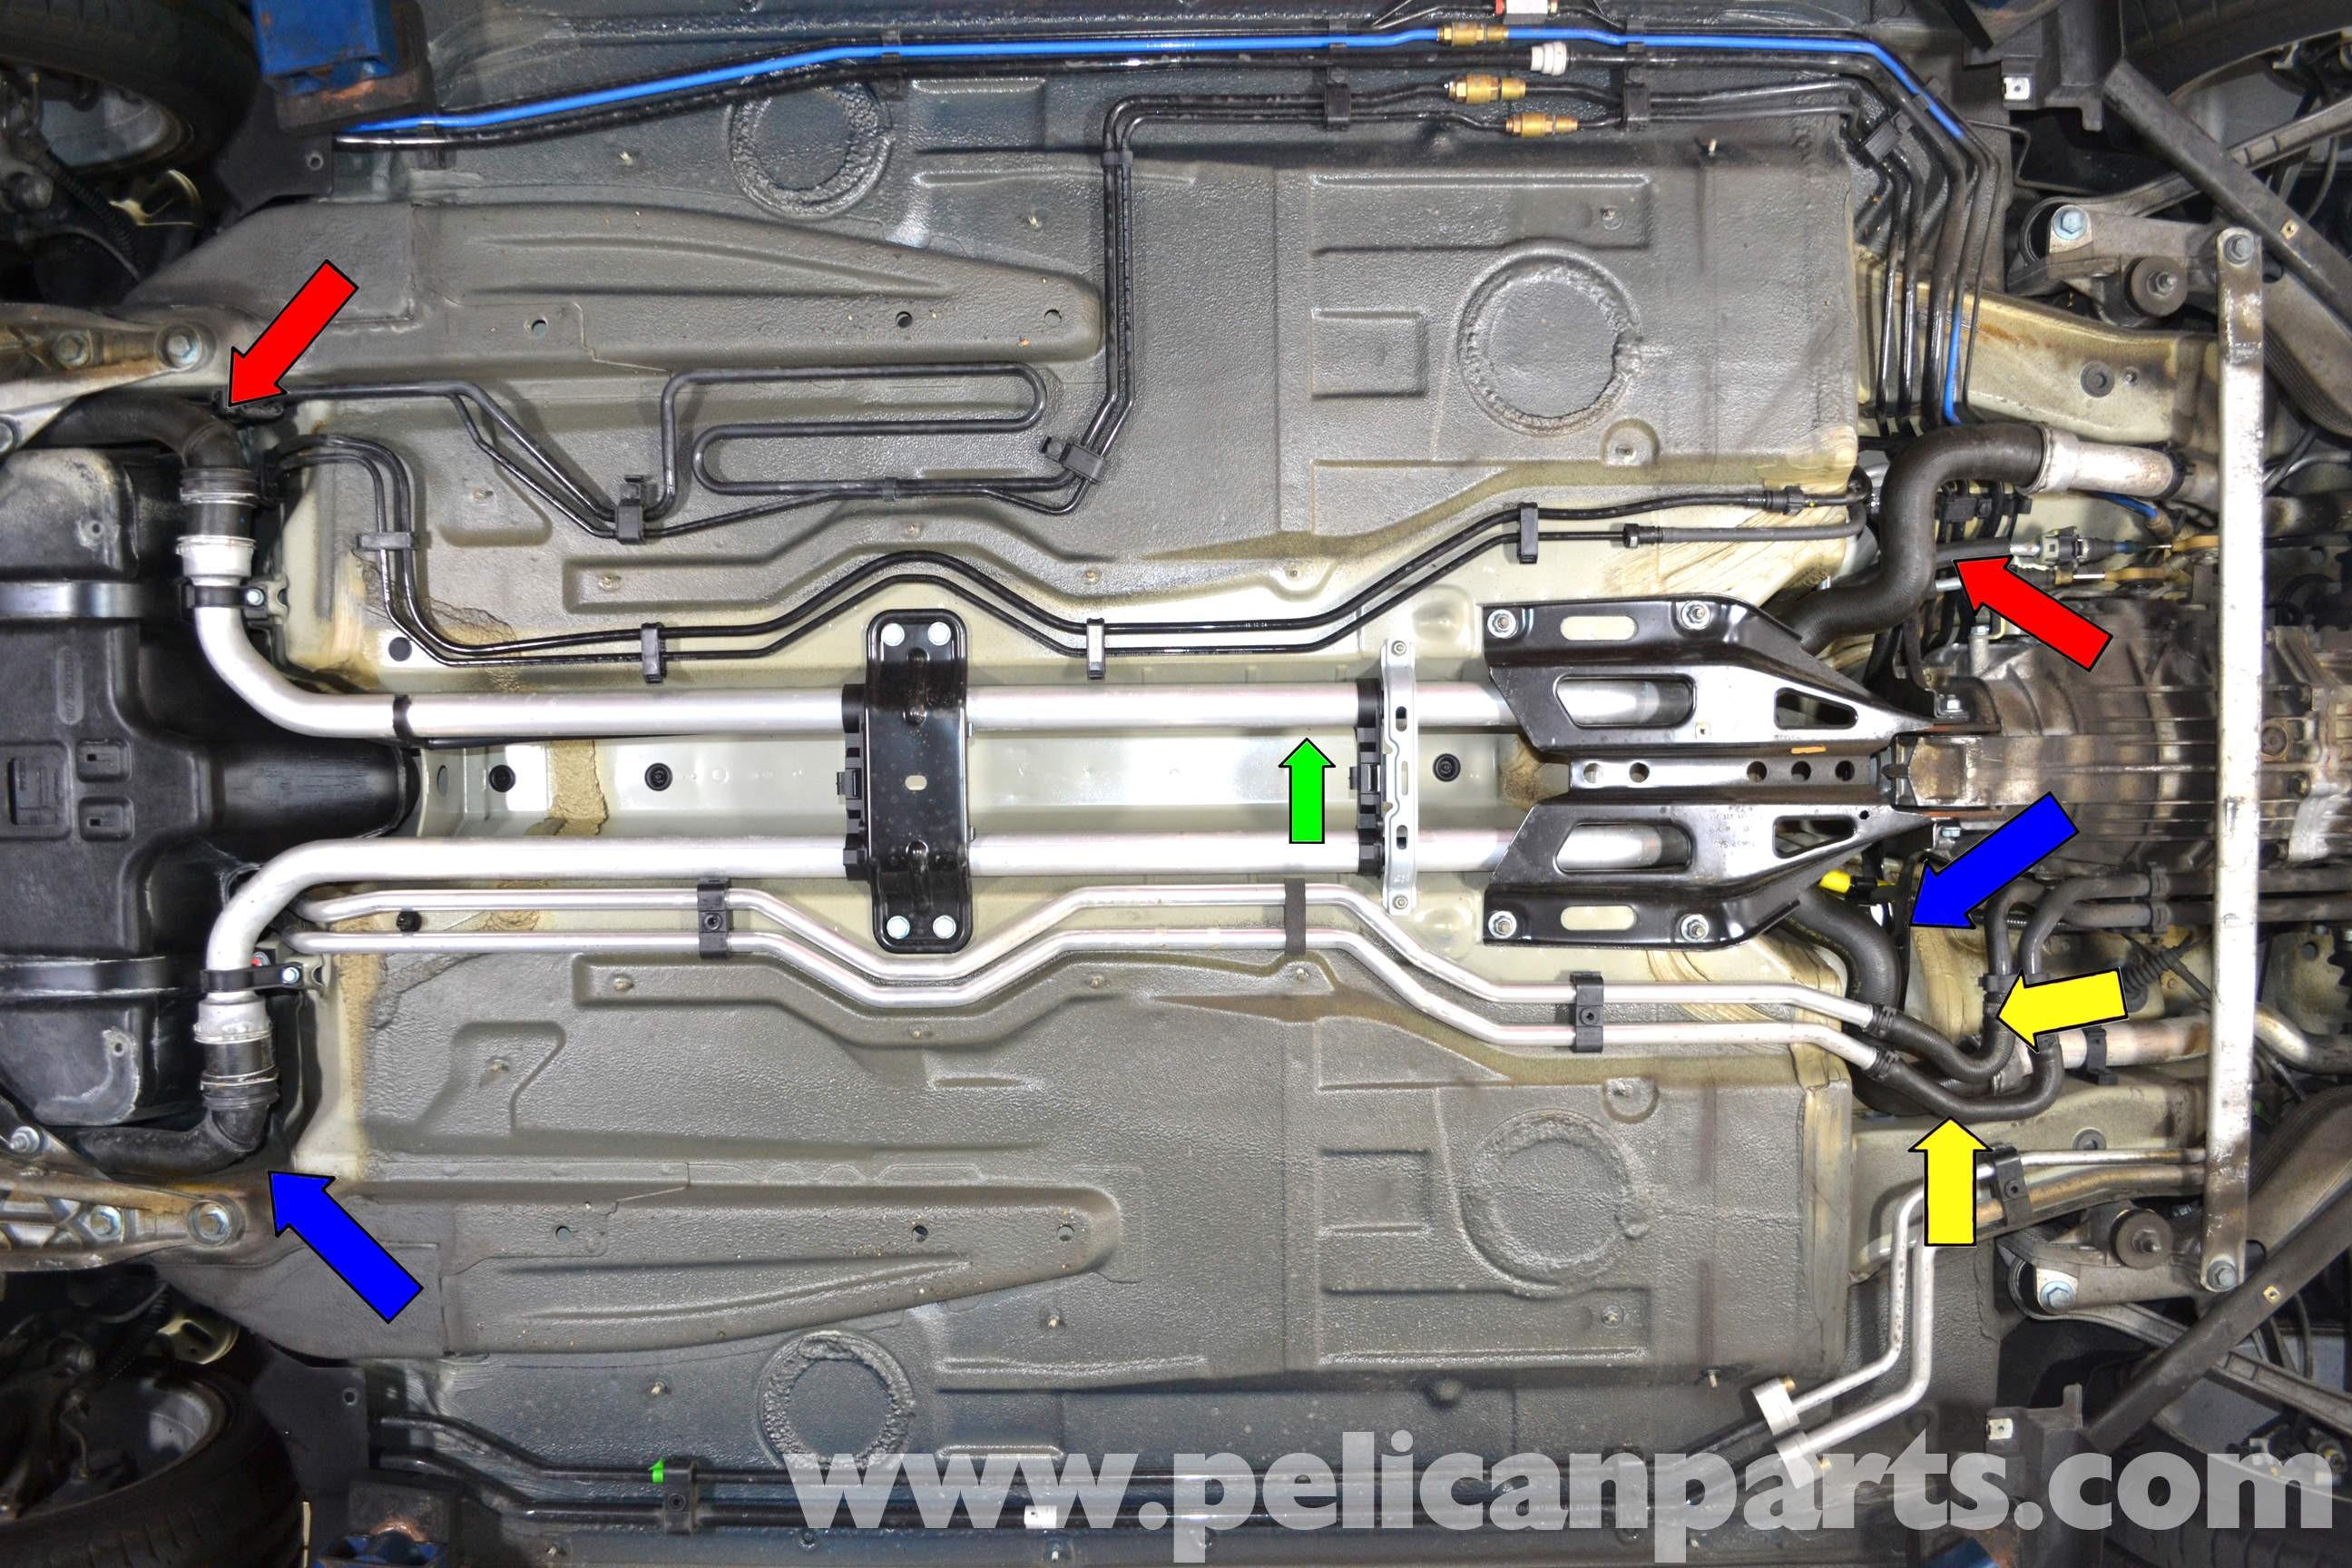 Porsche 996 Engine Diagram Porsche 911 Carrera Coolant Hose Replacement 996 1998 2005 997 Of Porsche 996 Engine Diagram